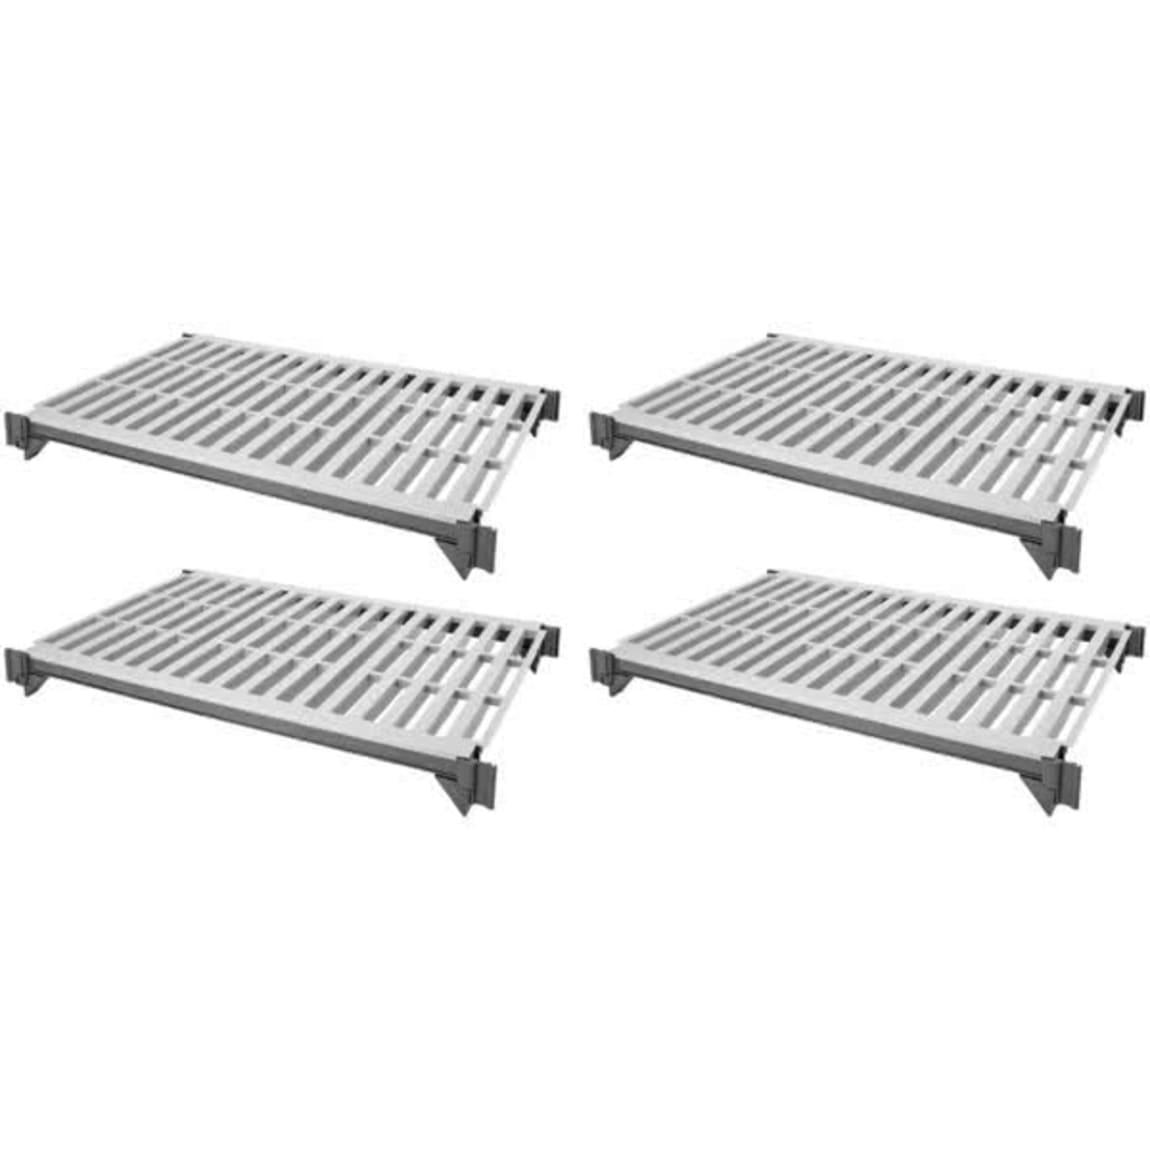 "Cambro ESK1836V4580 Camshelving® Elements Polymer Louvered Shelf Plate Kit - 18"" x 36"", Brushed Grap..."